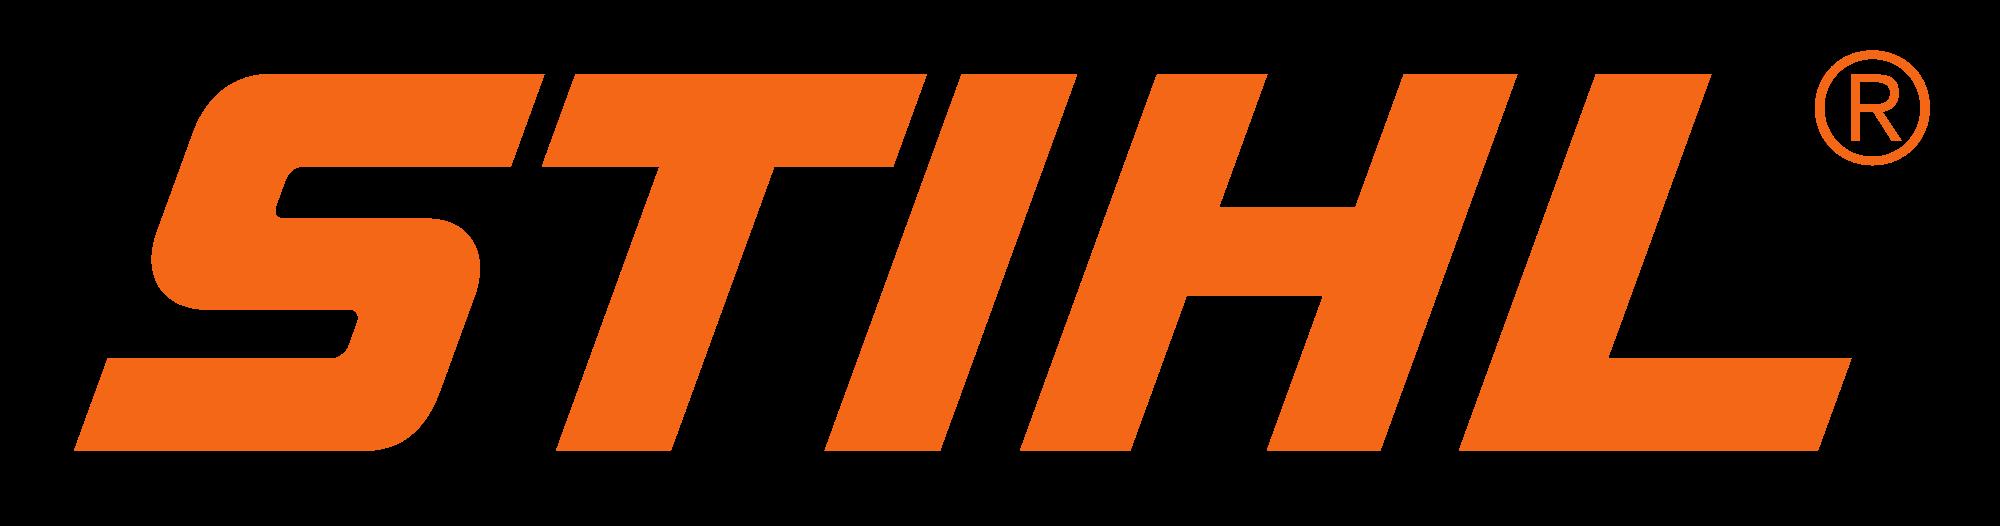 stihl  leading manufacturer  chainsaws  sprayers stihl logo vector stihl logo font